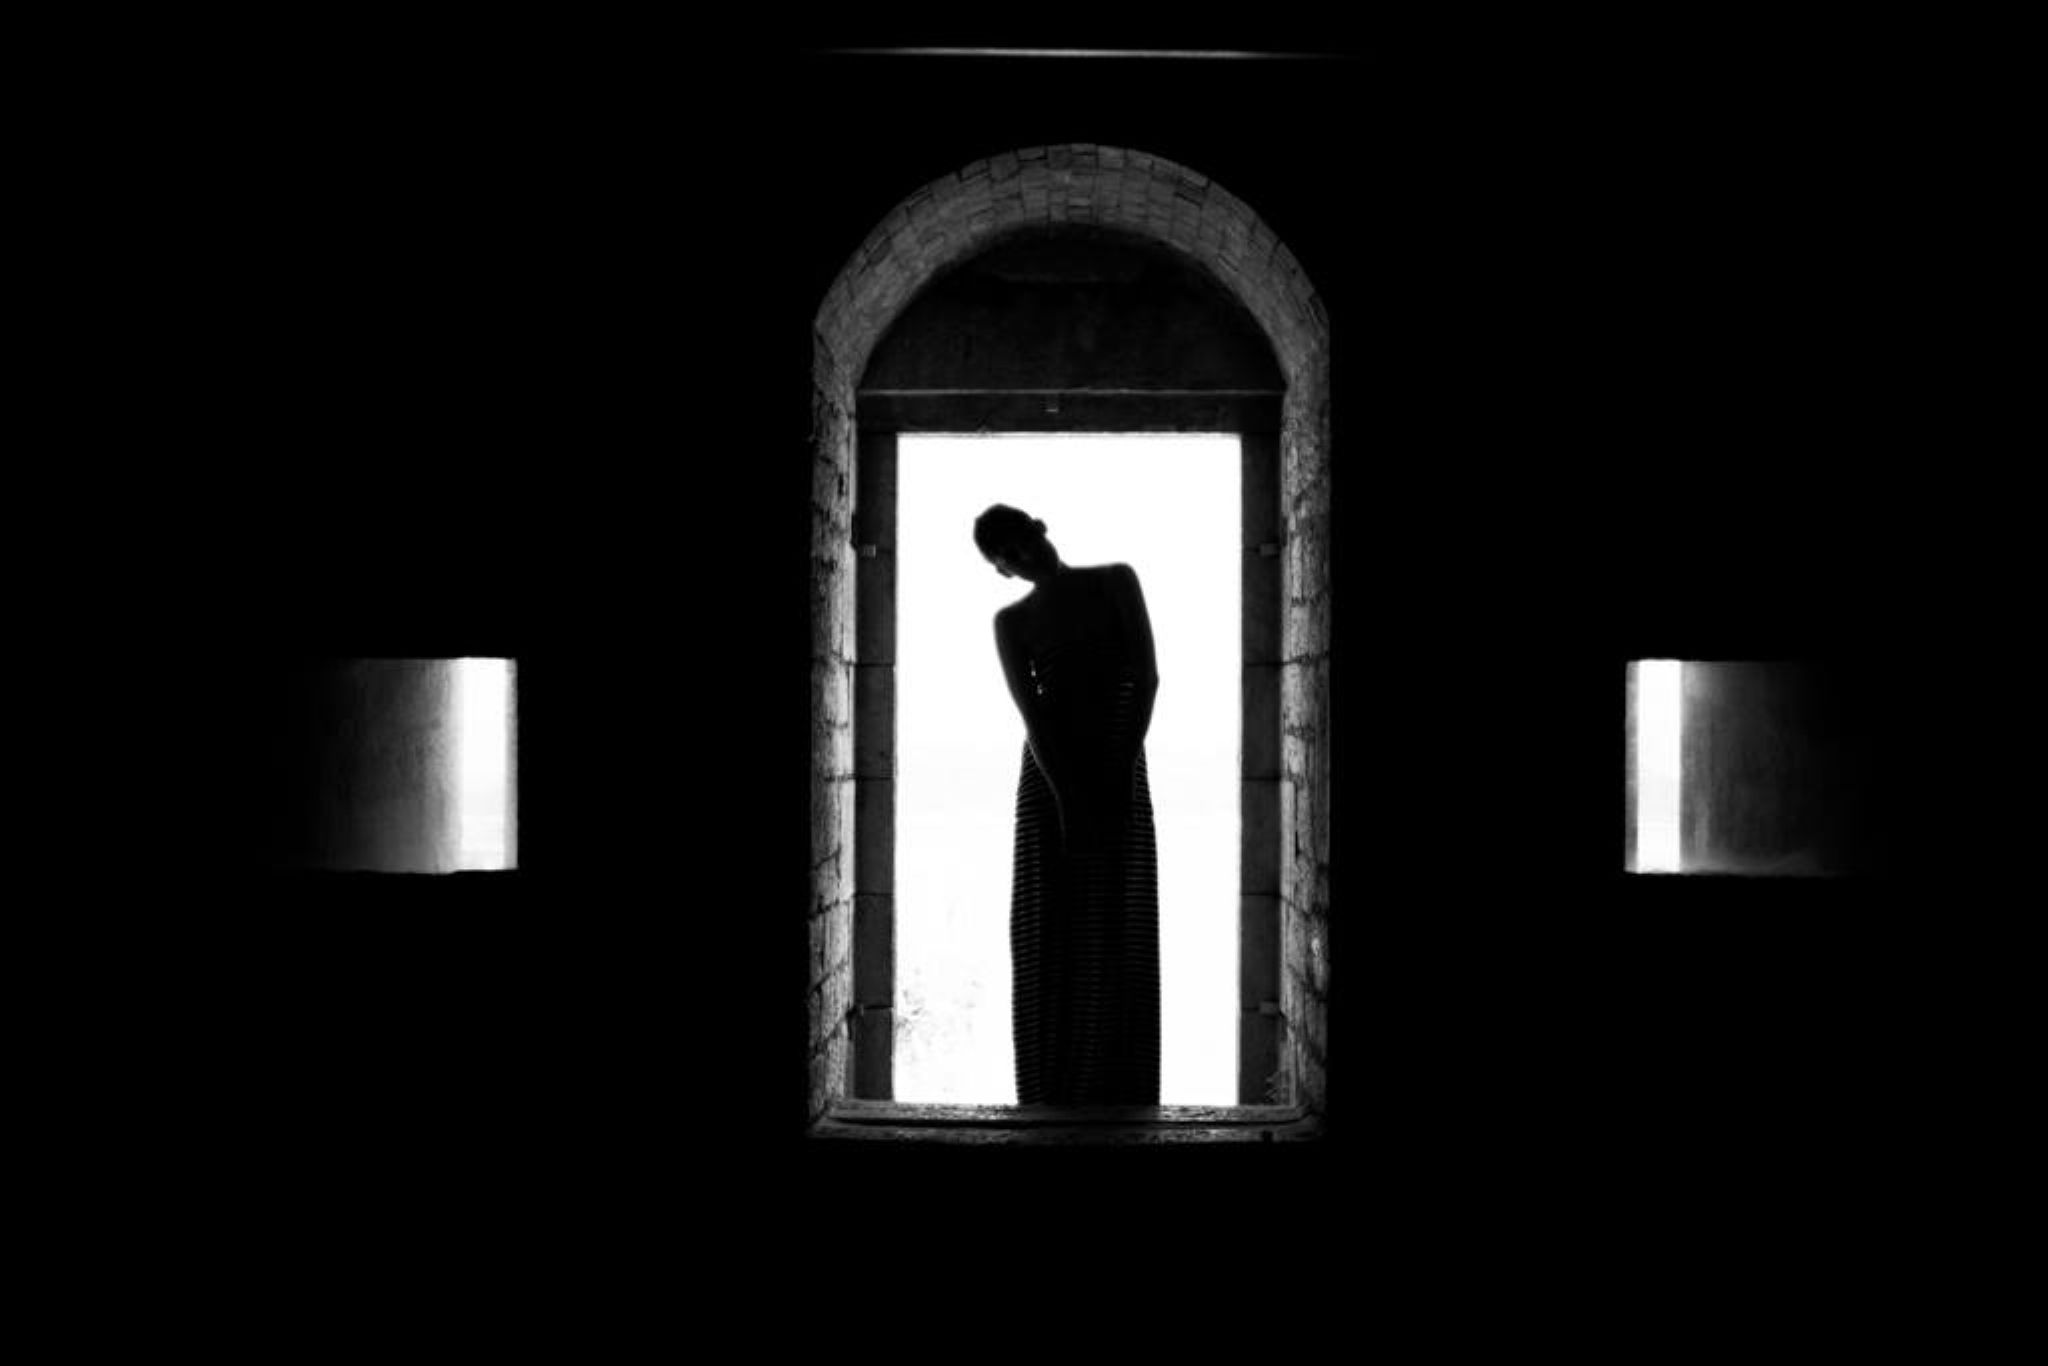 Shadows in Corfu by Vatos Paraskevas